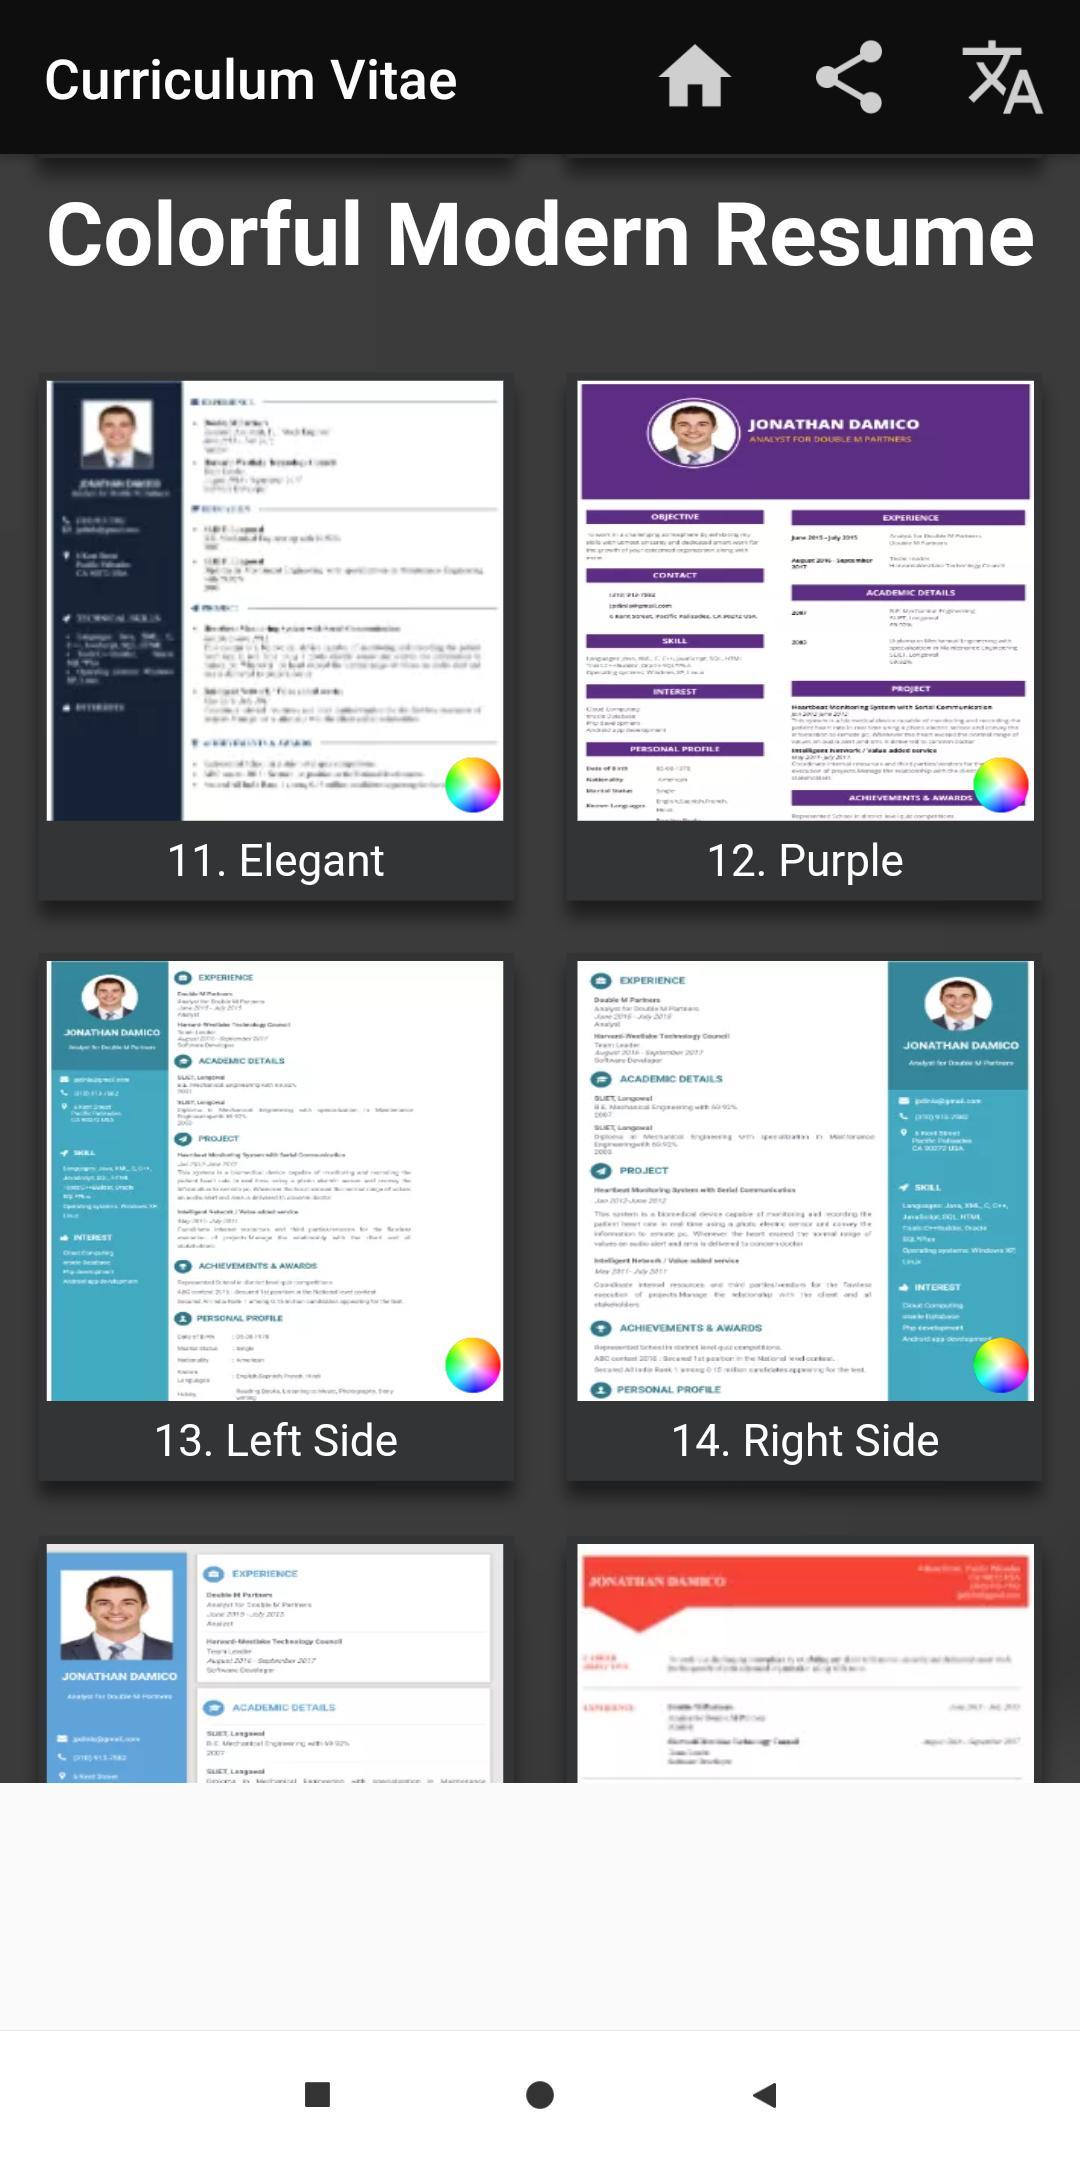 Curriculum vitae App CV Builder